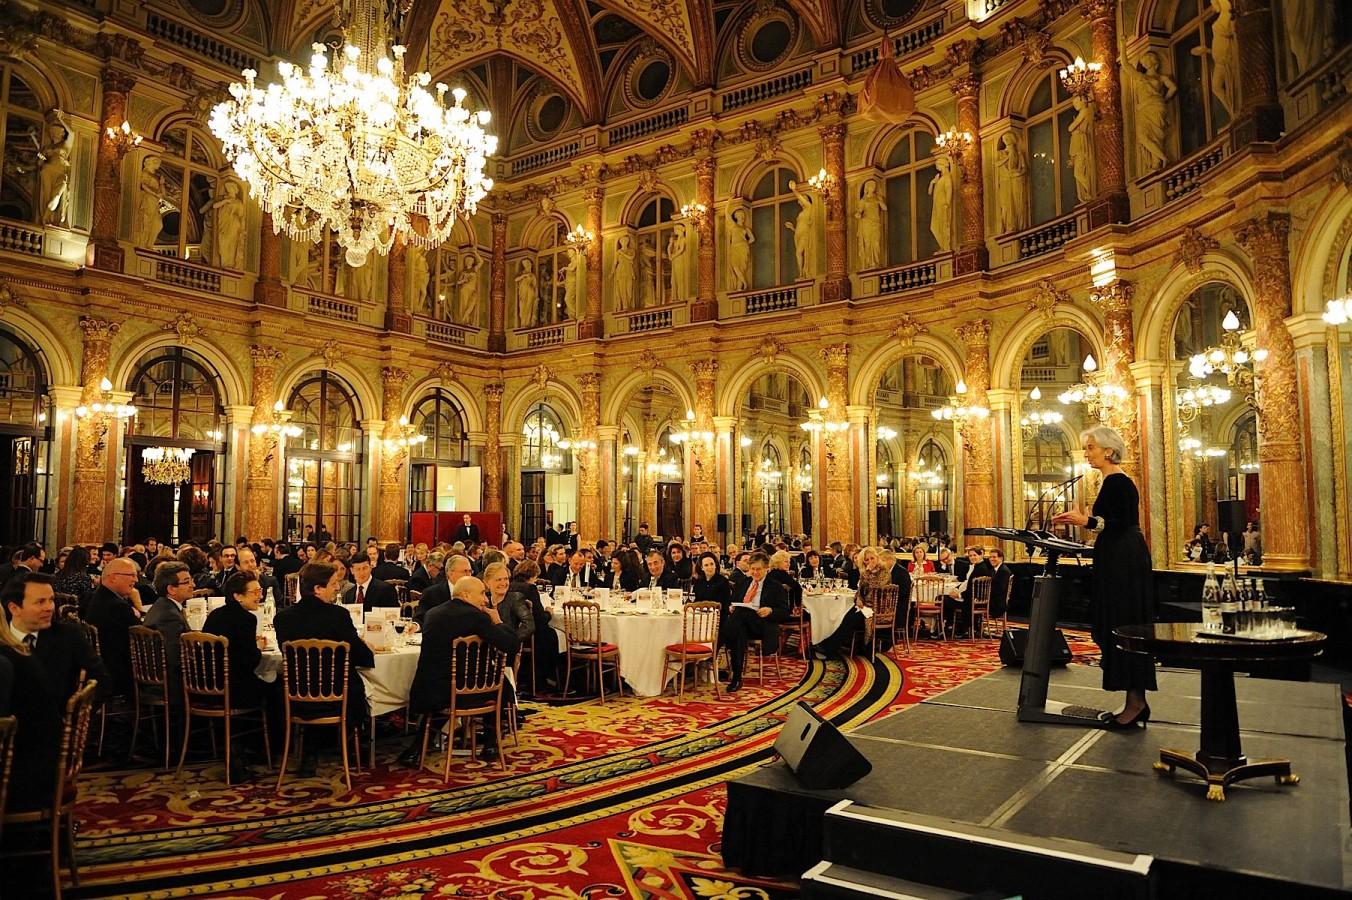 Dinner at Grand hotel Intercontinental Paris